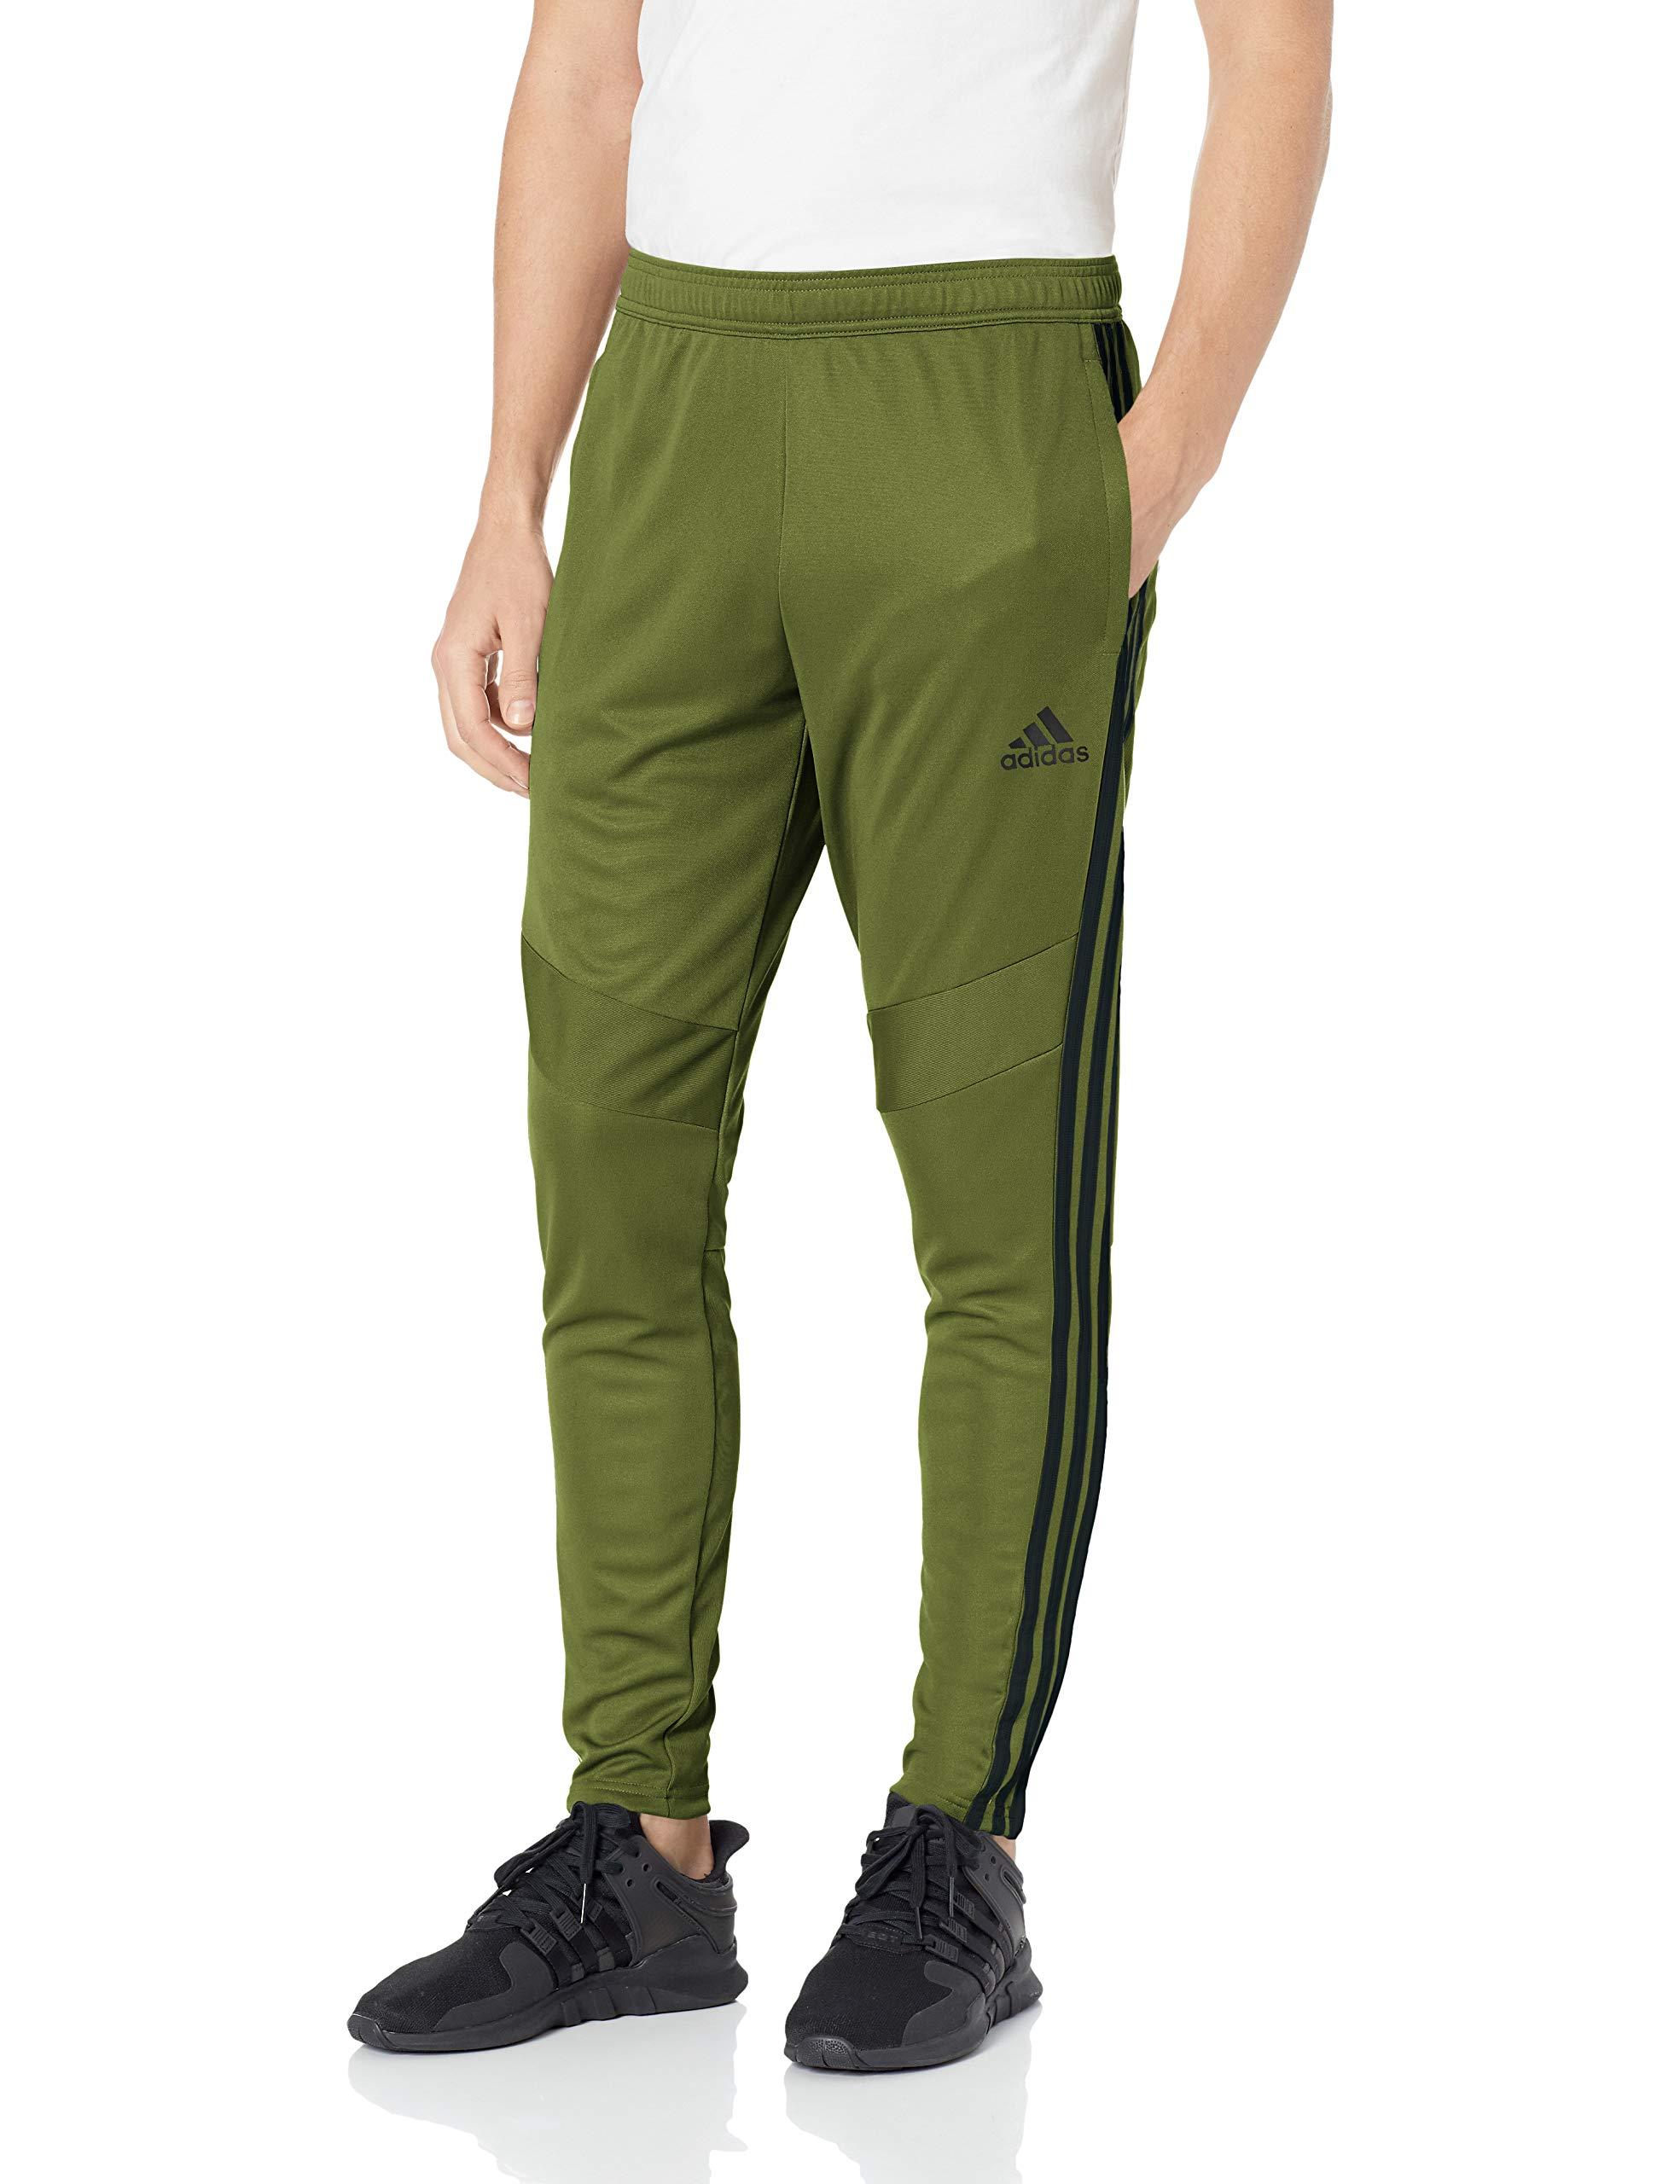 adidas Tiro19 Pant, Open Green, XX-Large